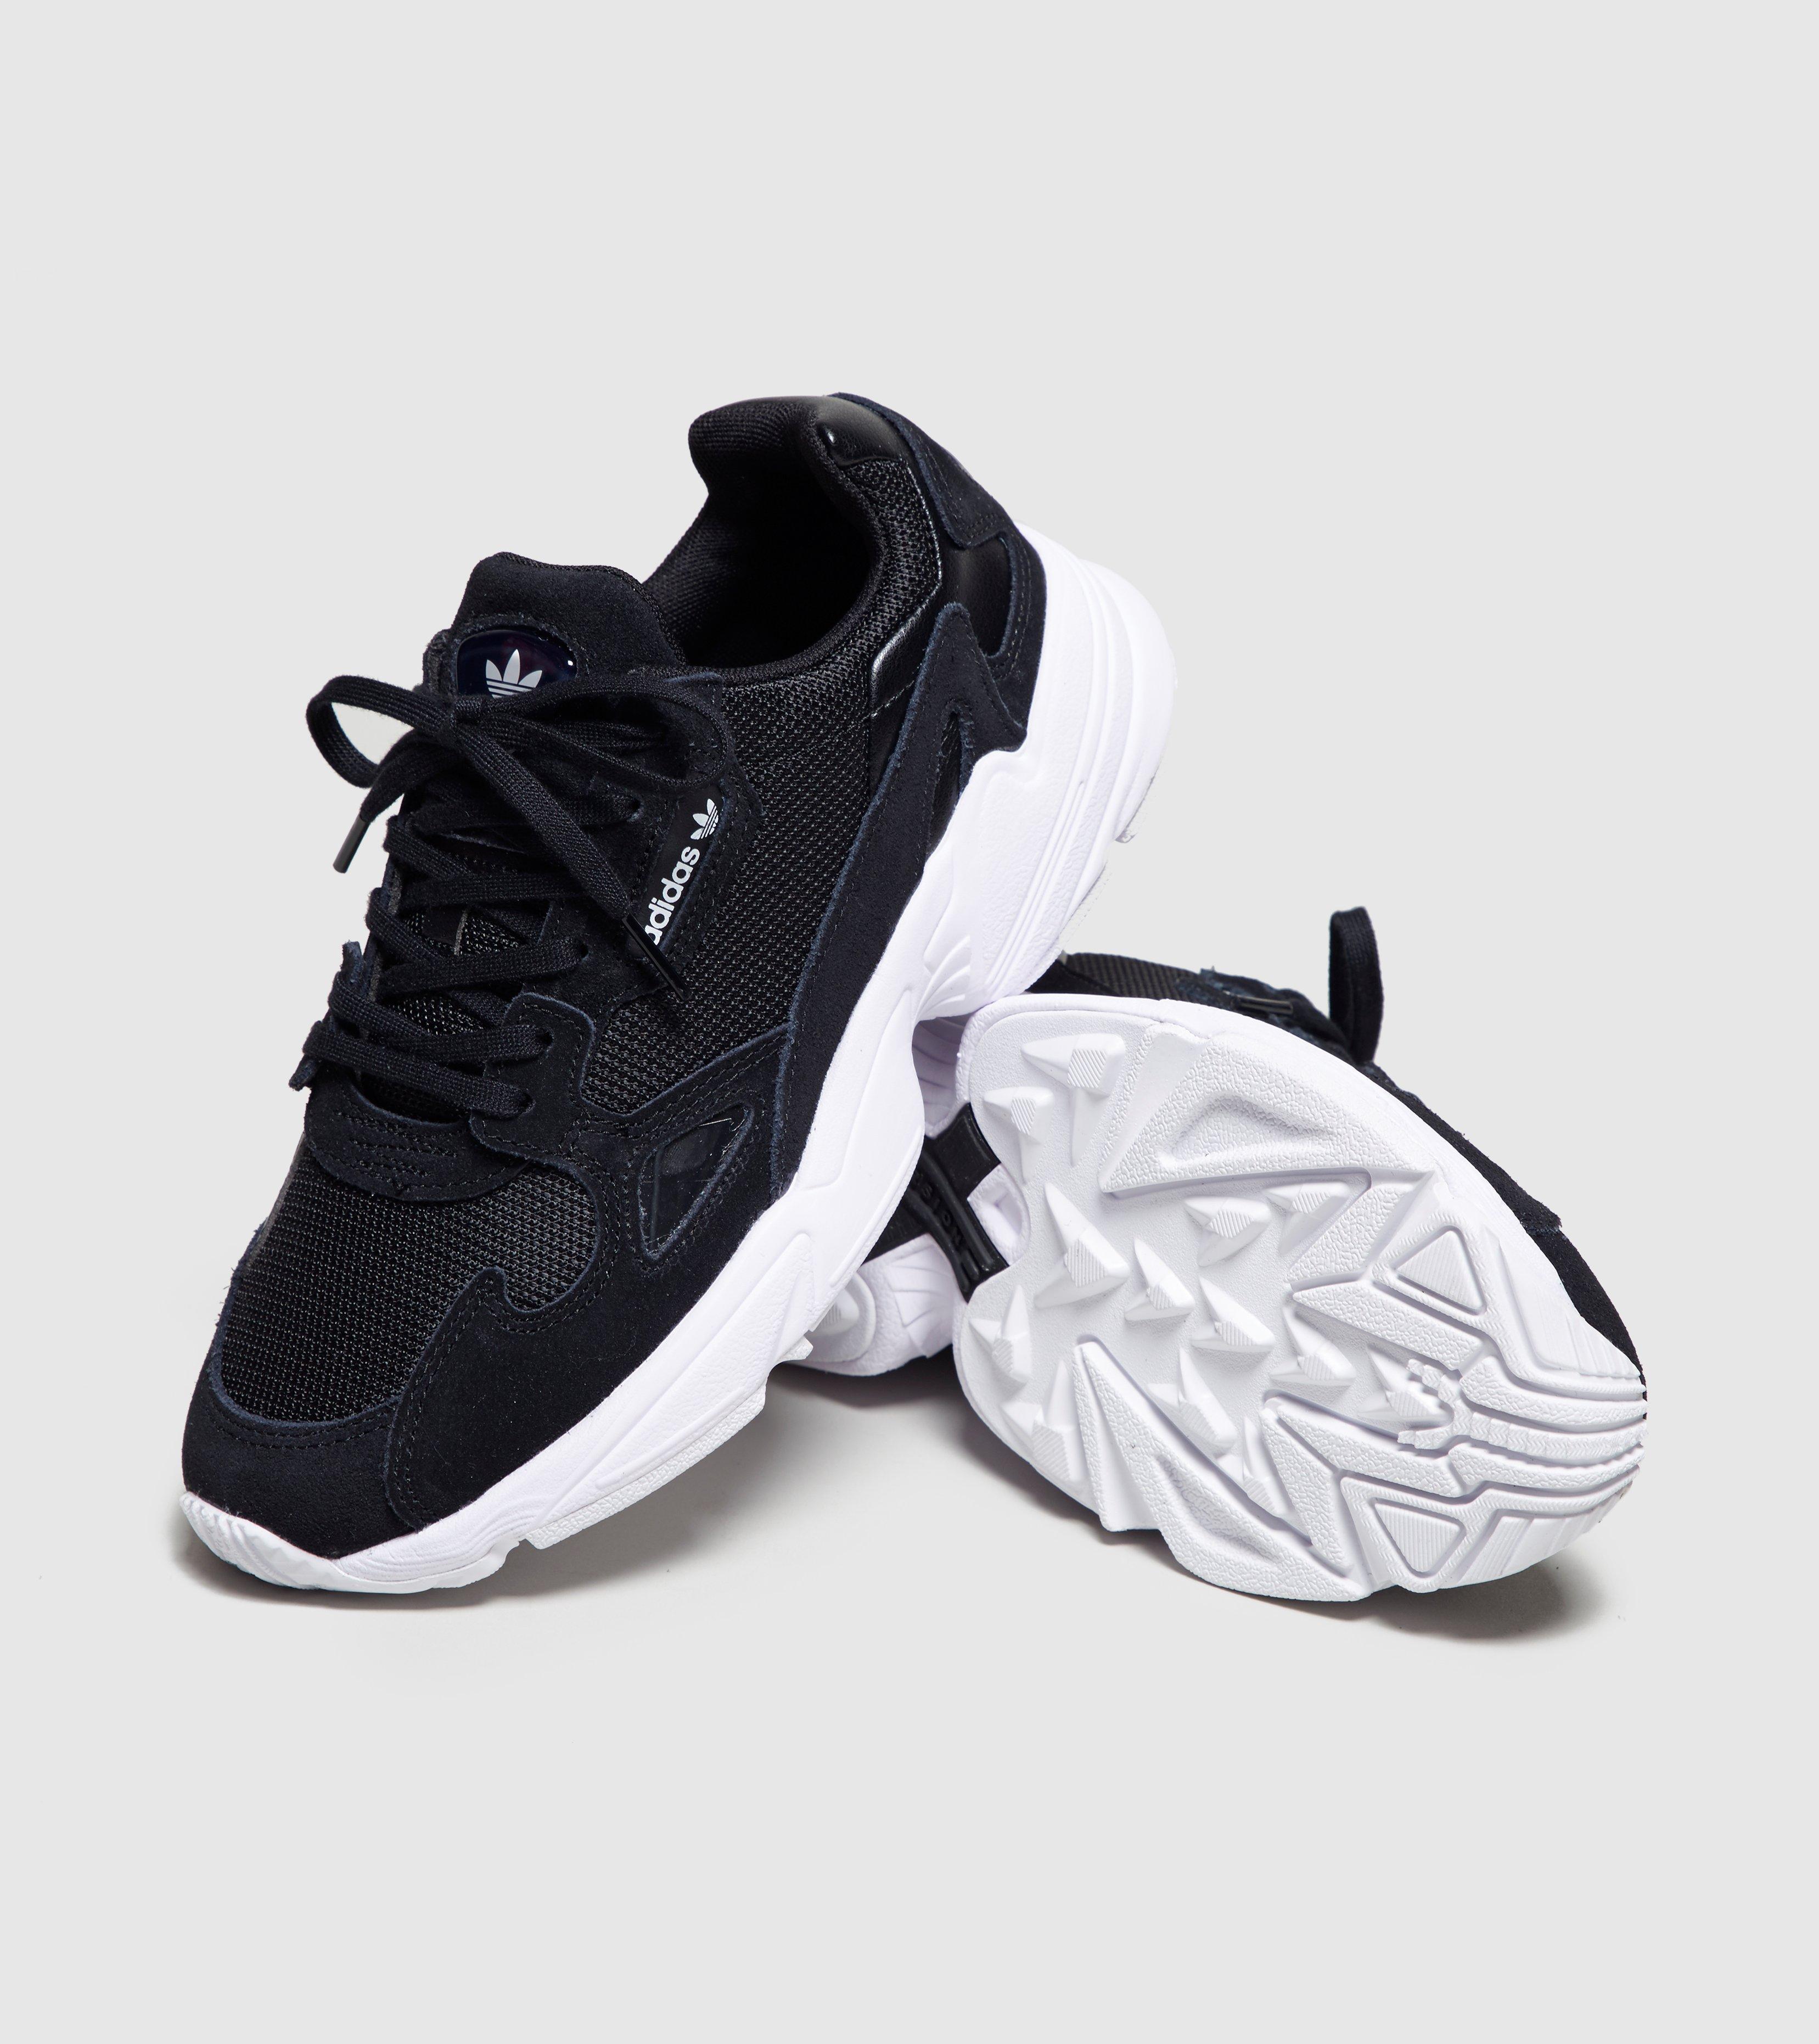 21c8771f6a94 Lyst - adidas Originals Falcon Women s in Black